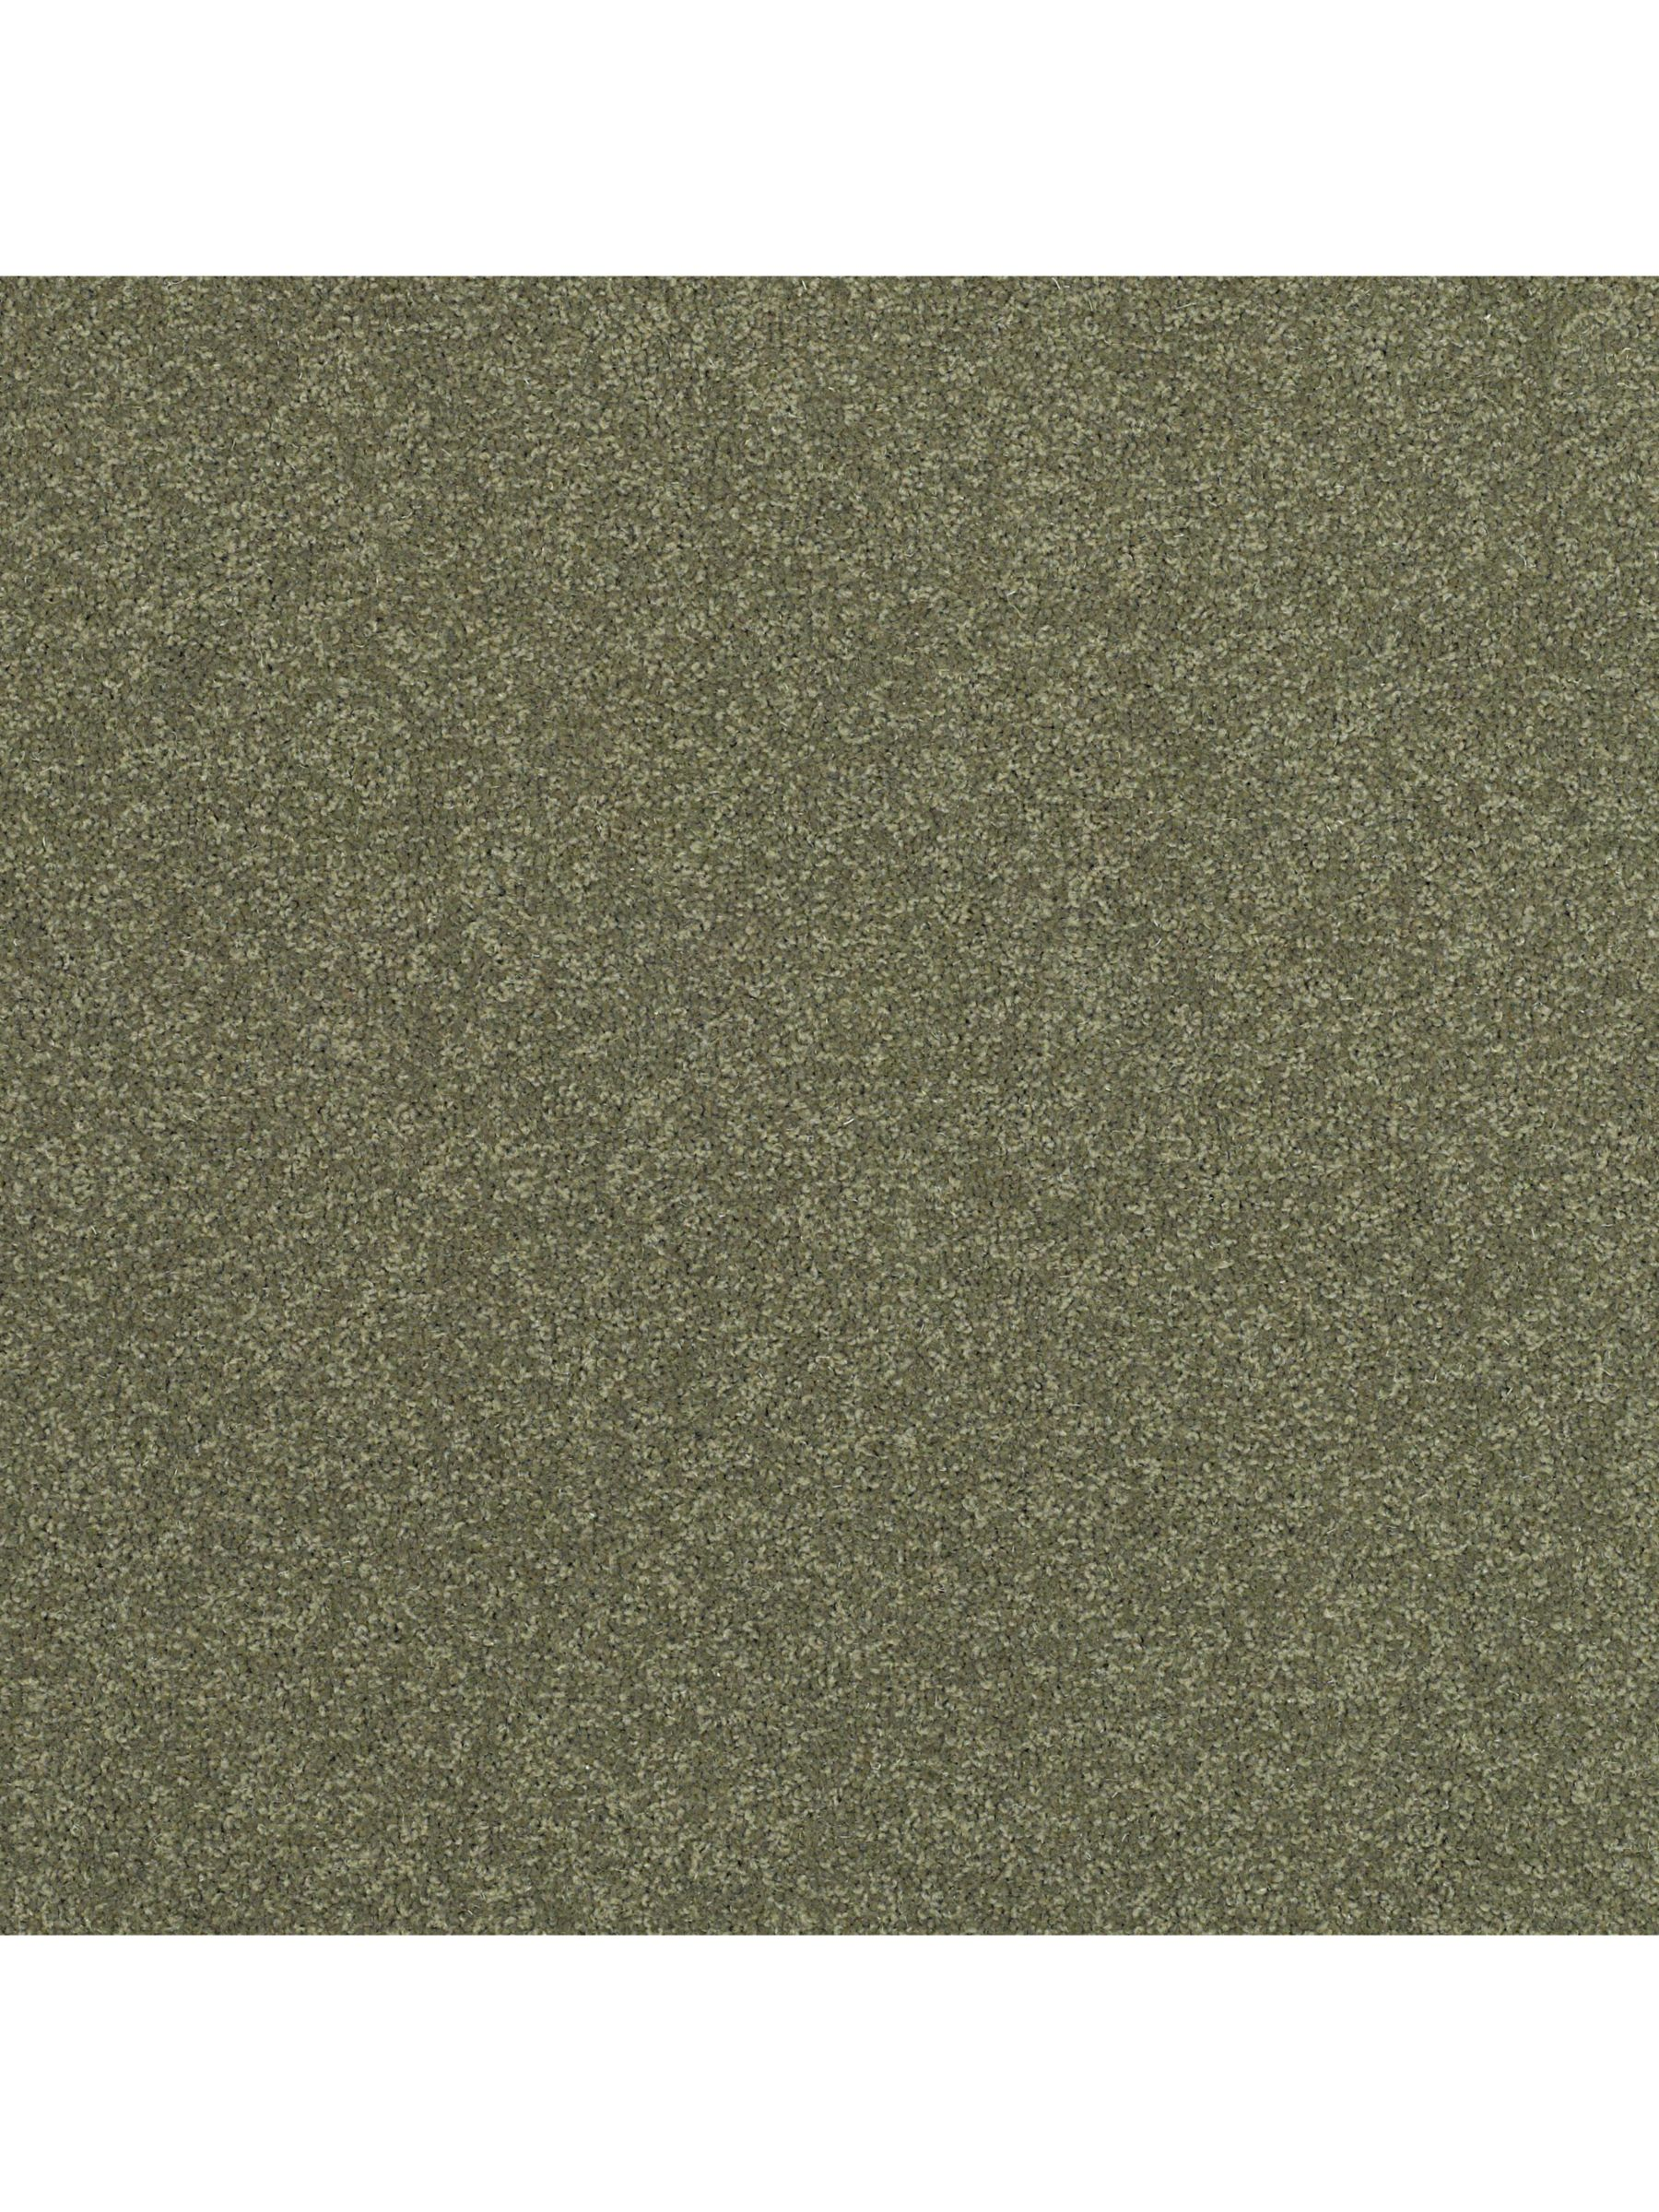 Adam Carpets Adam Carpets Fine Worcester Twist Carpet